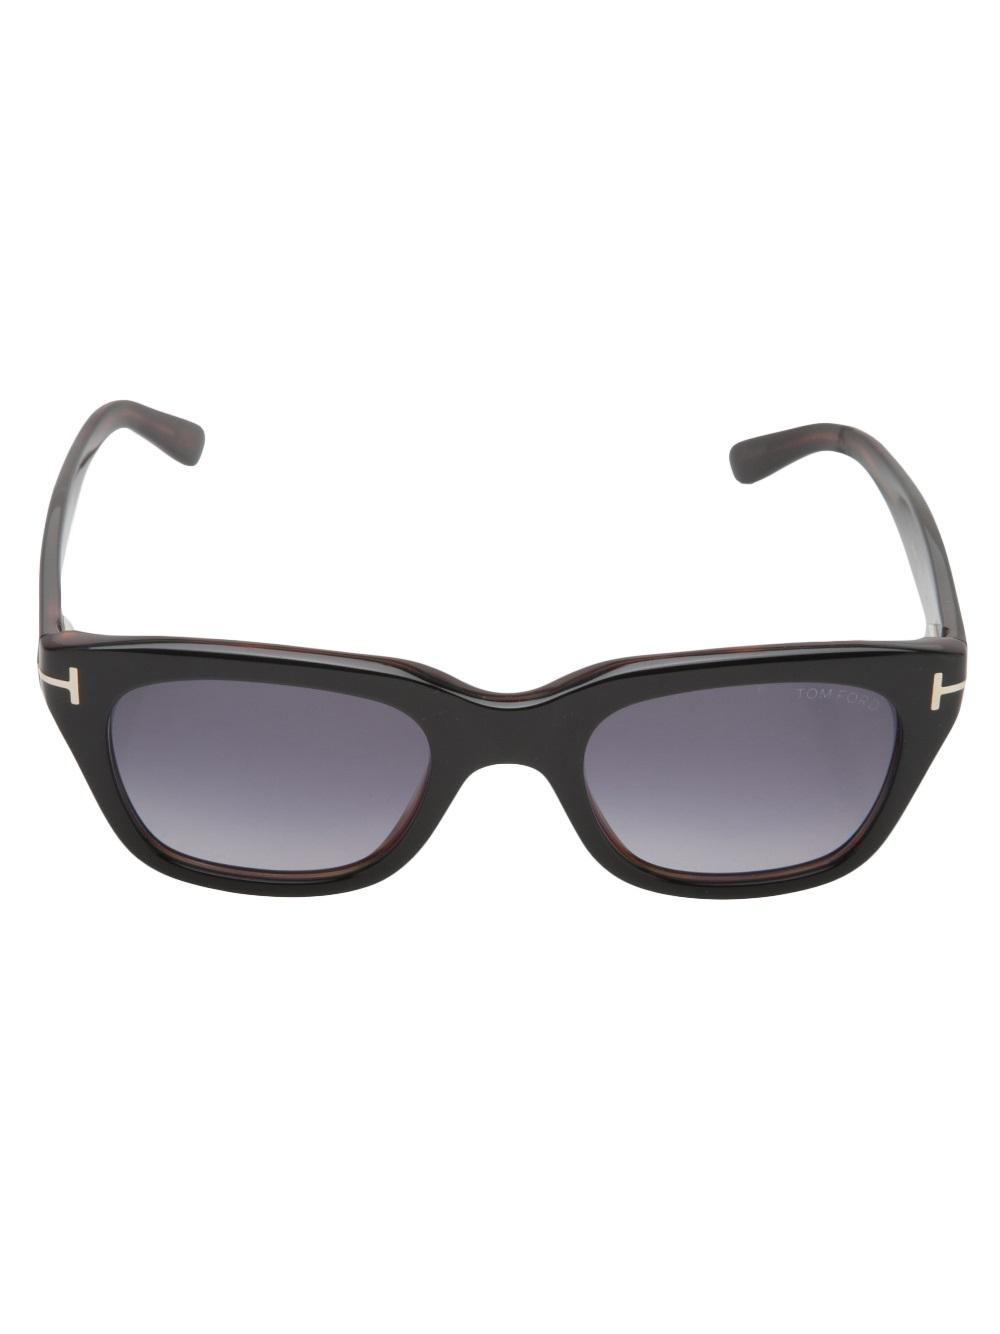 lyst tom ford snowdon sunglasses in black. Black Bedroom Furniture Sets. Home Design Ideas